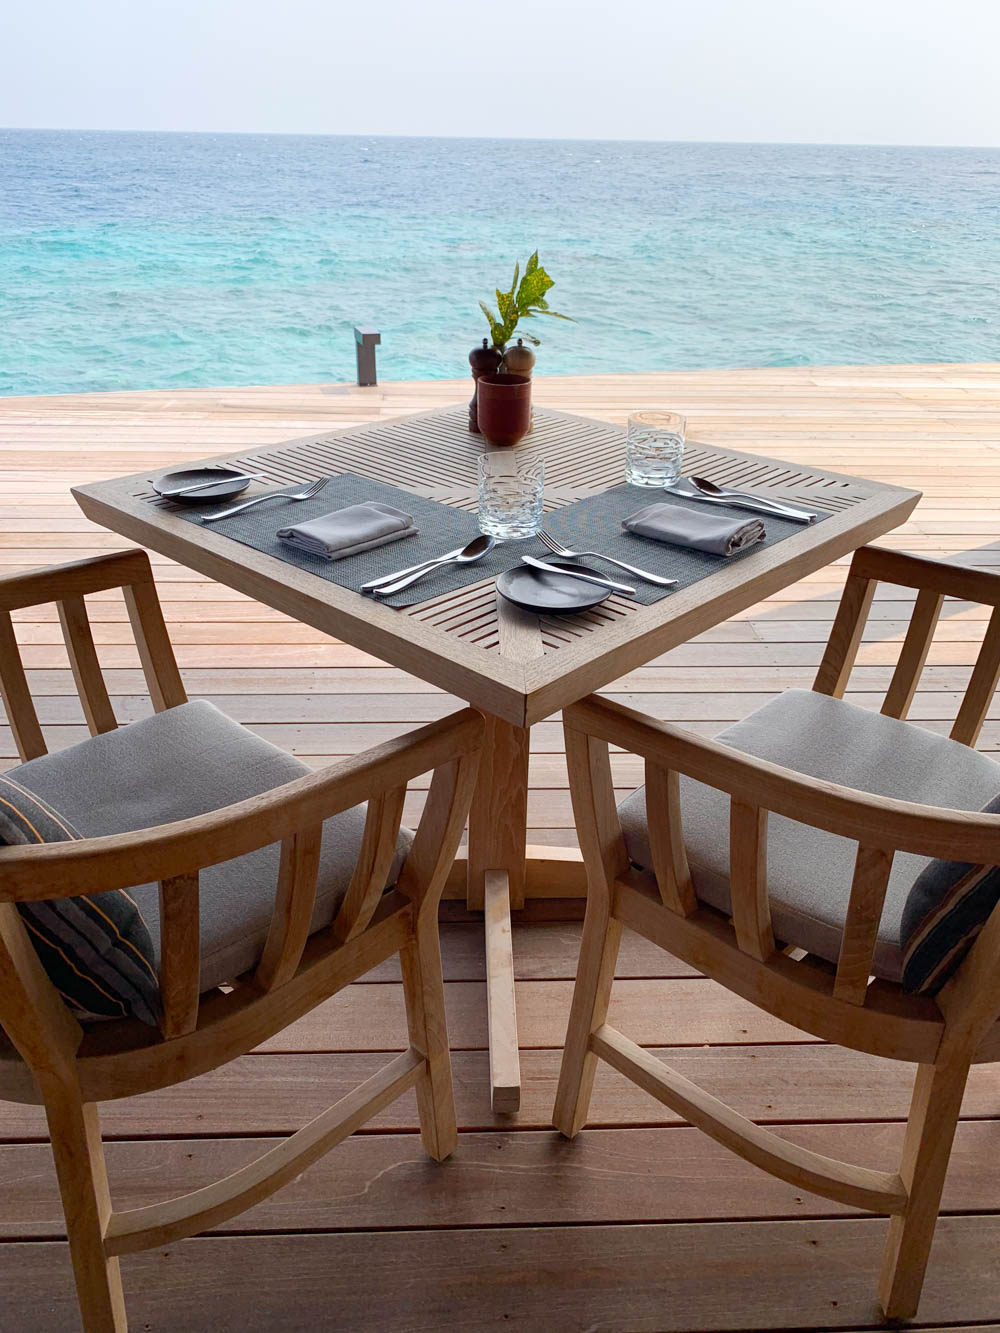 Maldives_Resort_Honeymoon_Kudadoo_MaldivesTravelAdvisor-9.jpg